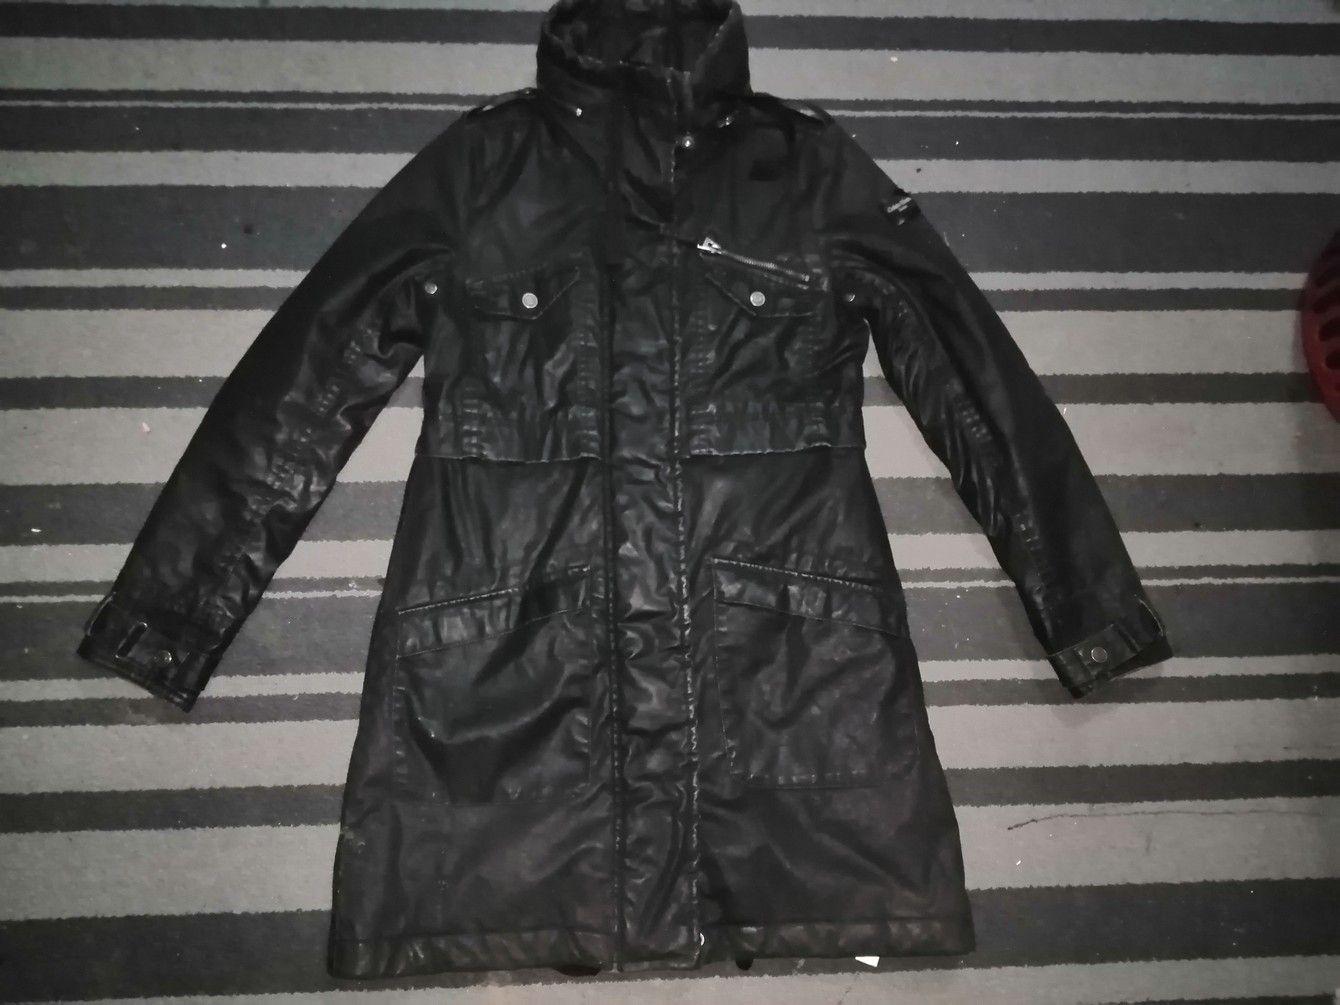 All Black Calvin Klein Fashion Criminal J001 Calvin Klein Jacket Hoodie Size Xs 150 Hoodie Jacket Calvin Klein Fashion Stylish Jackets [ 1005 x 1340 Pixel ]